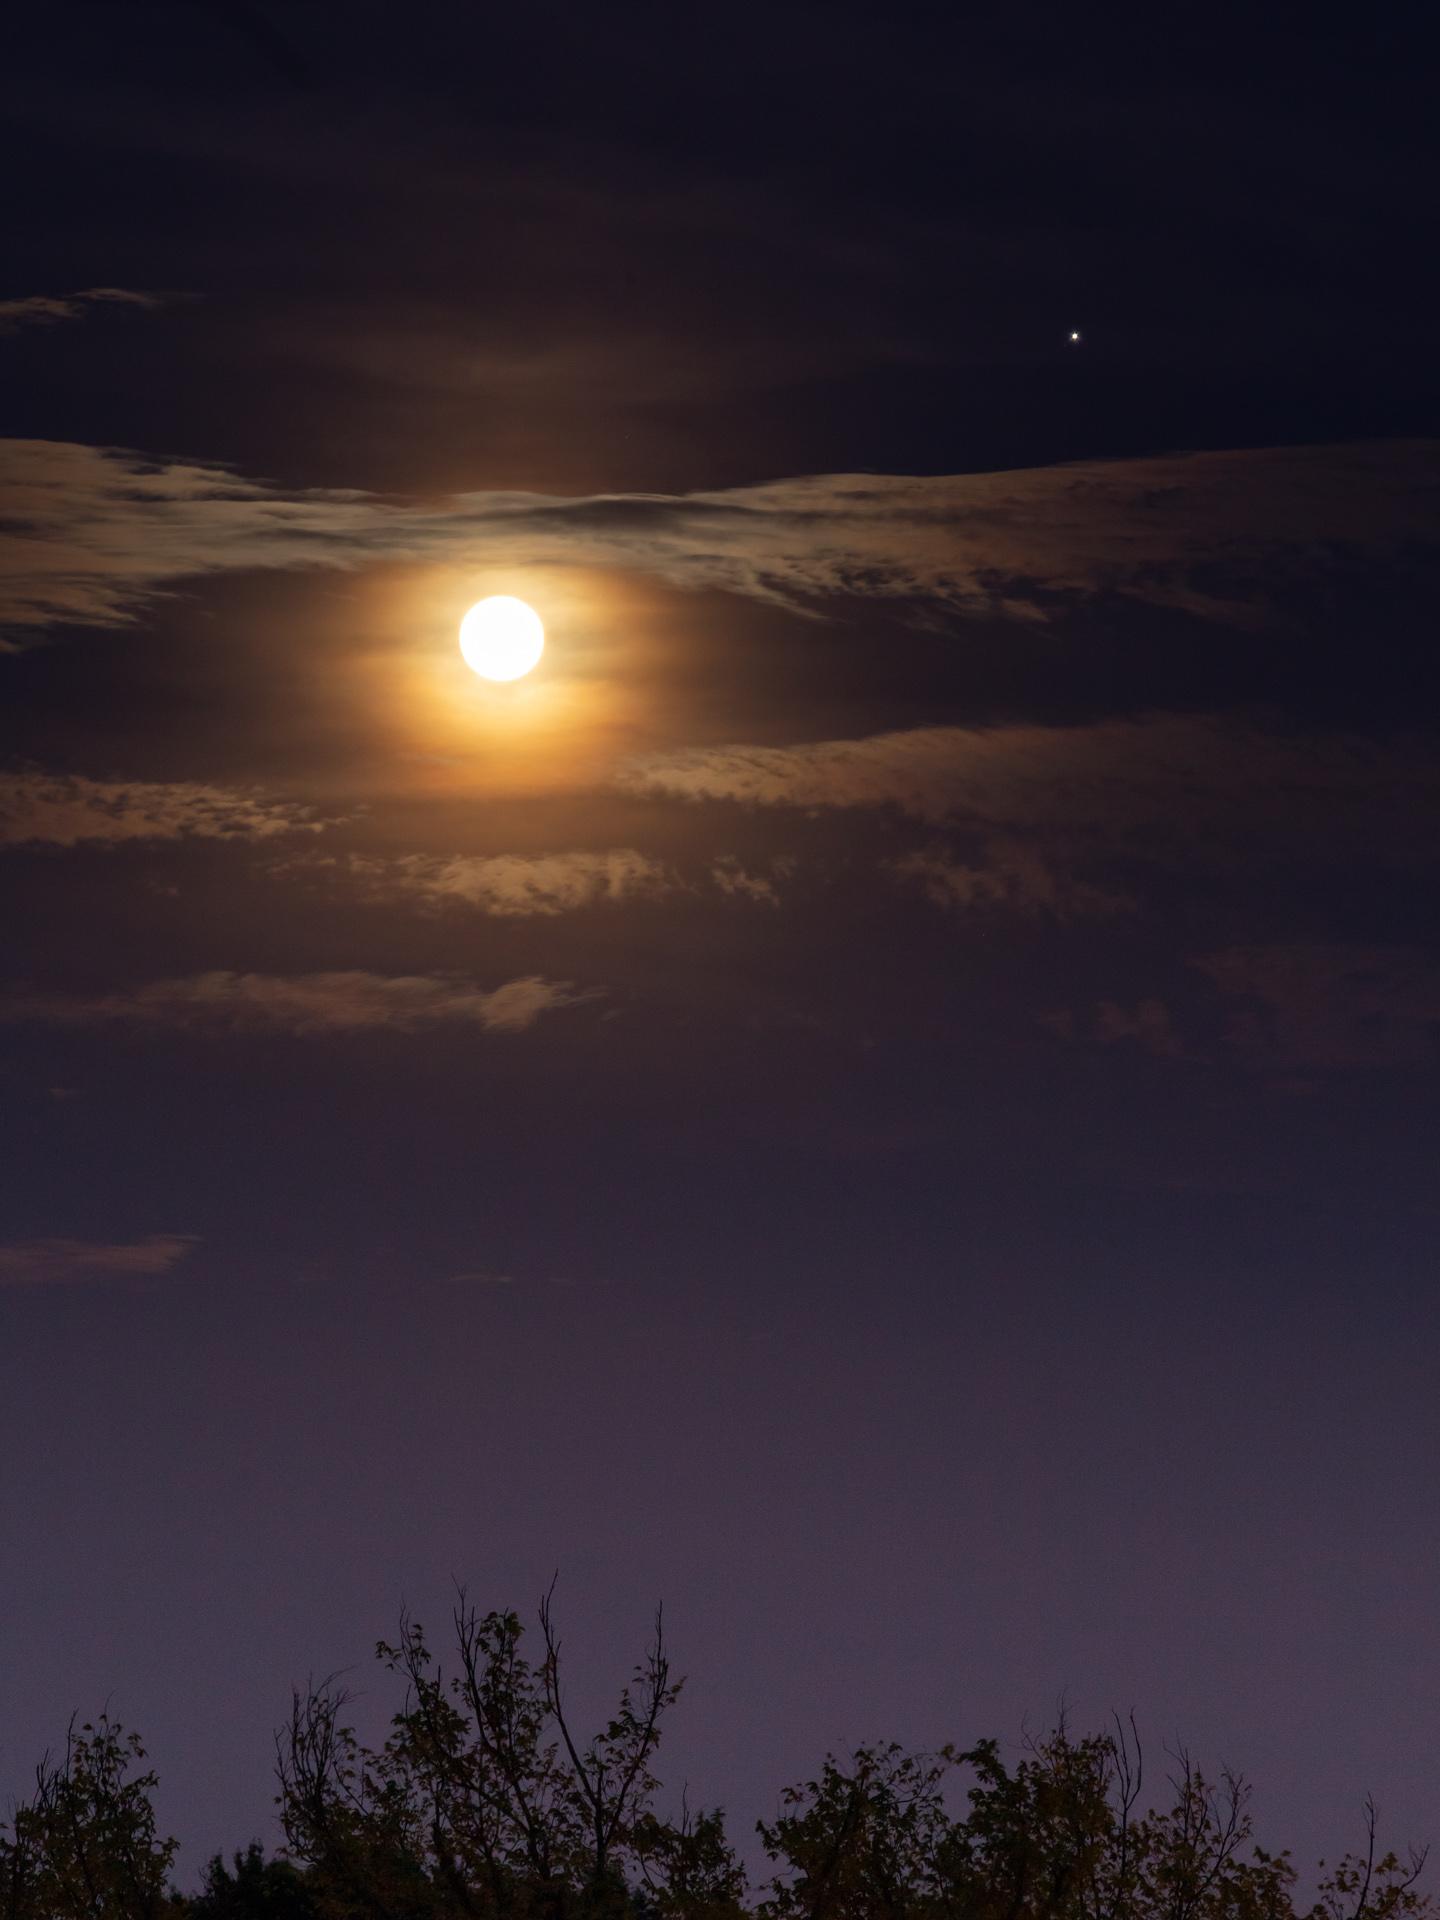 Full Strawberry Moon and Jupiter | 20190616 2116 E:38.96x77.00@84m